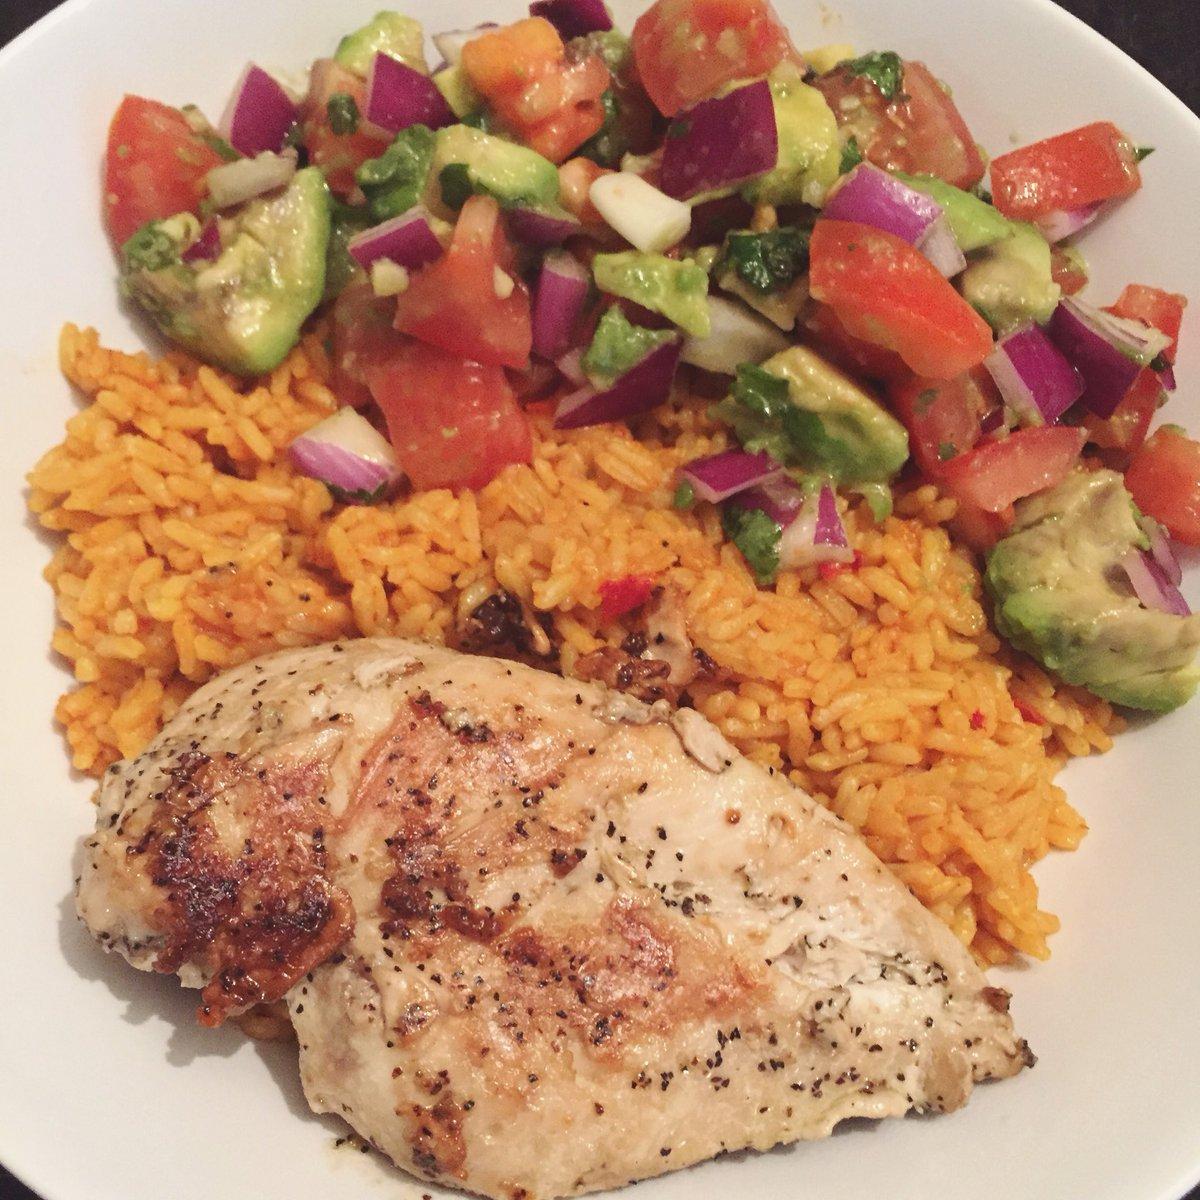 Yummy makeshift burrito bowl for dinner 😋 #HealthyFood #foodporn https://t.co/DjDW2h7nZv